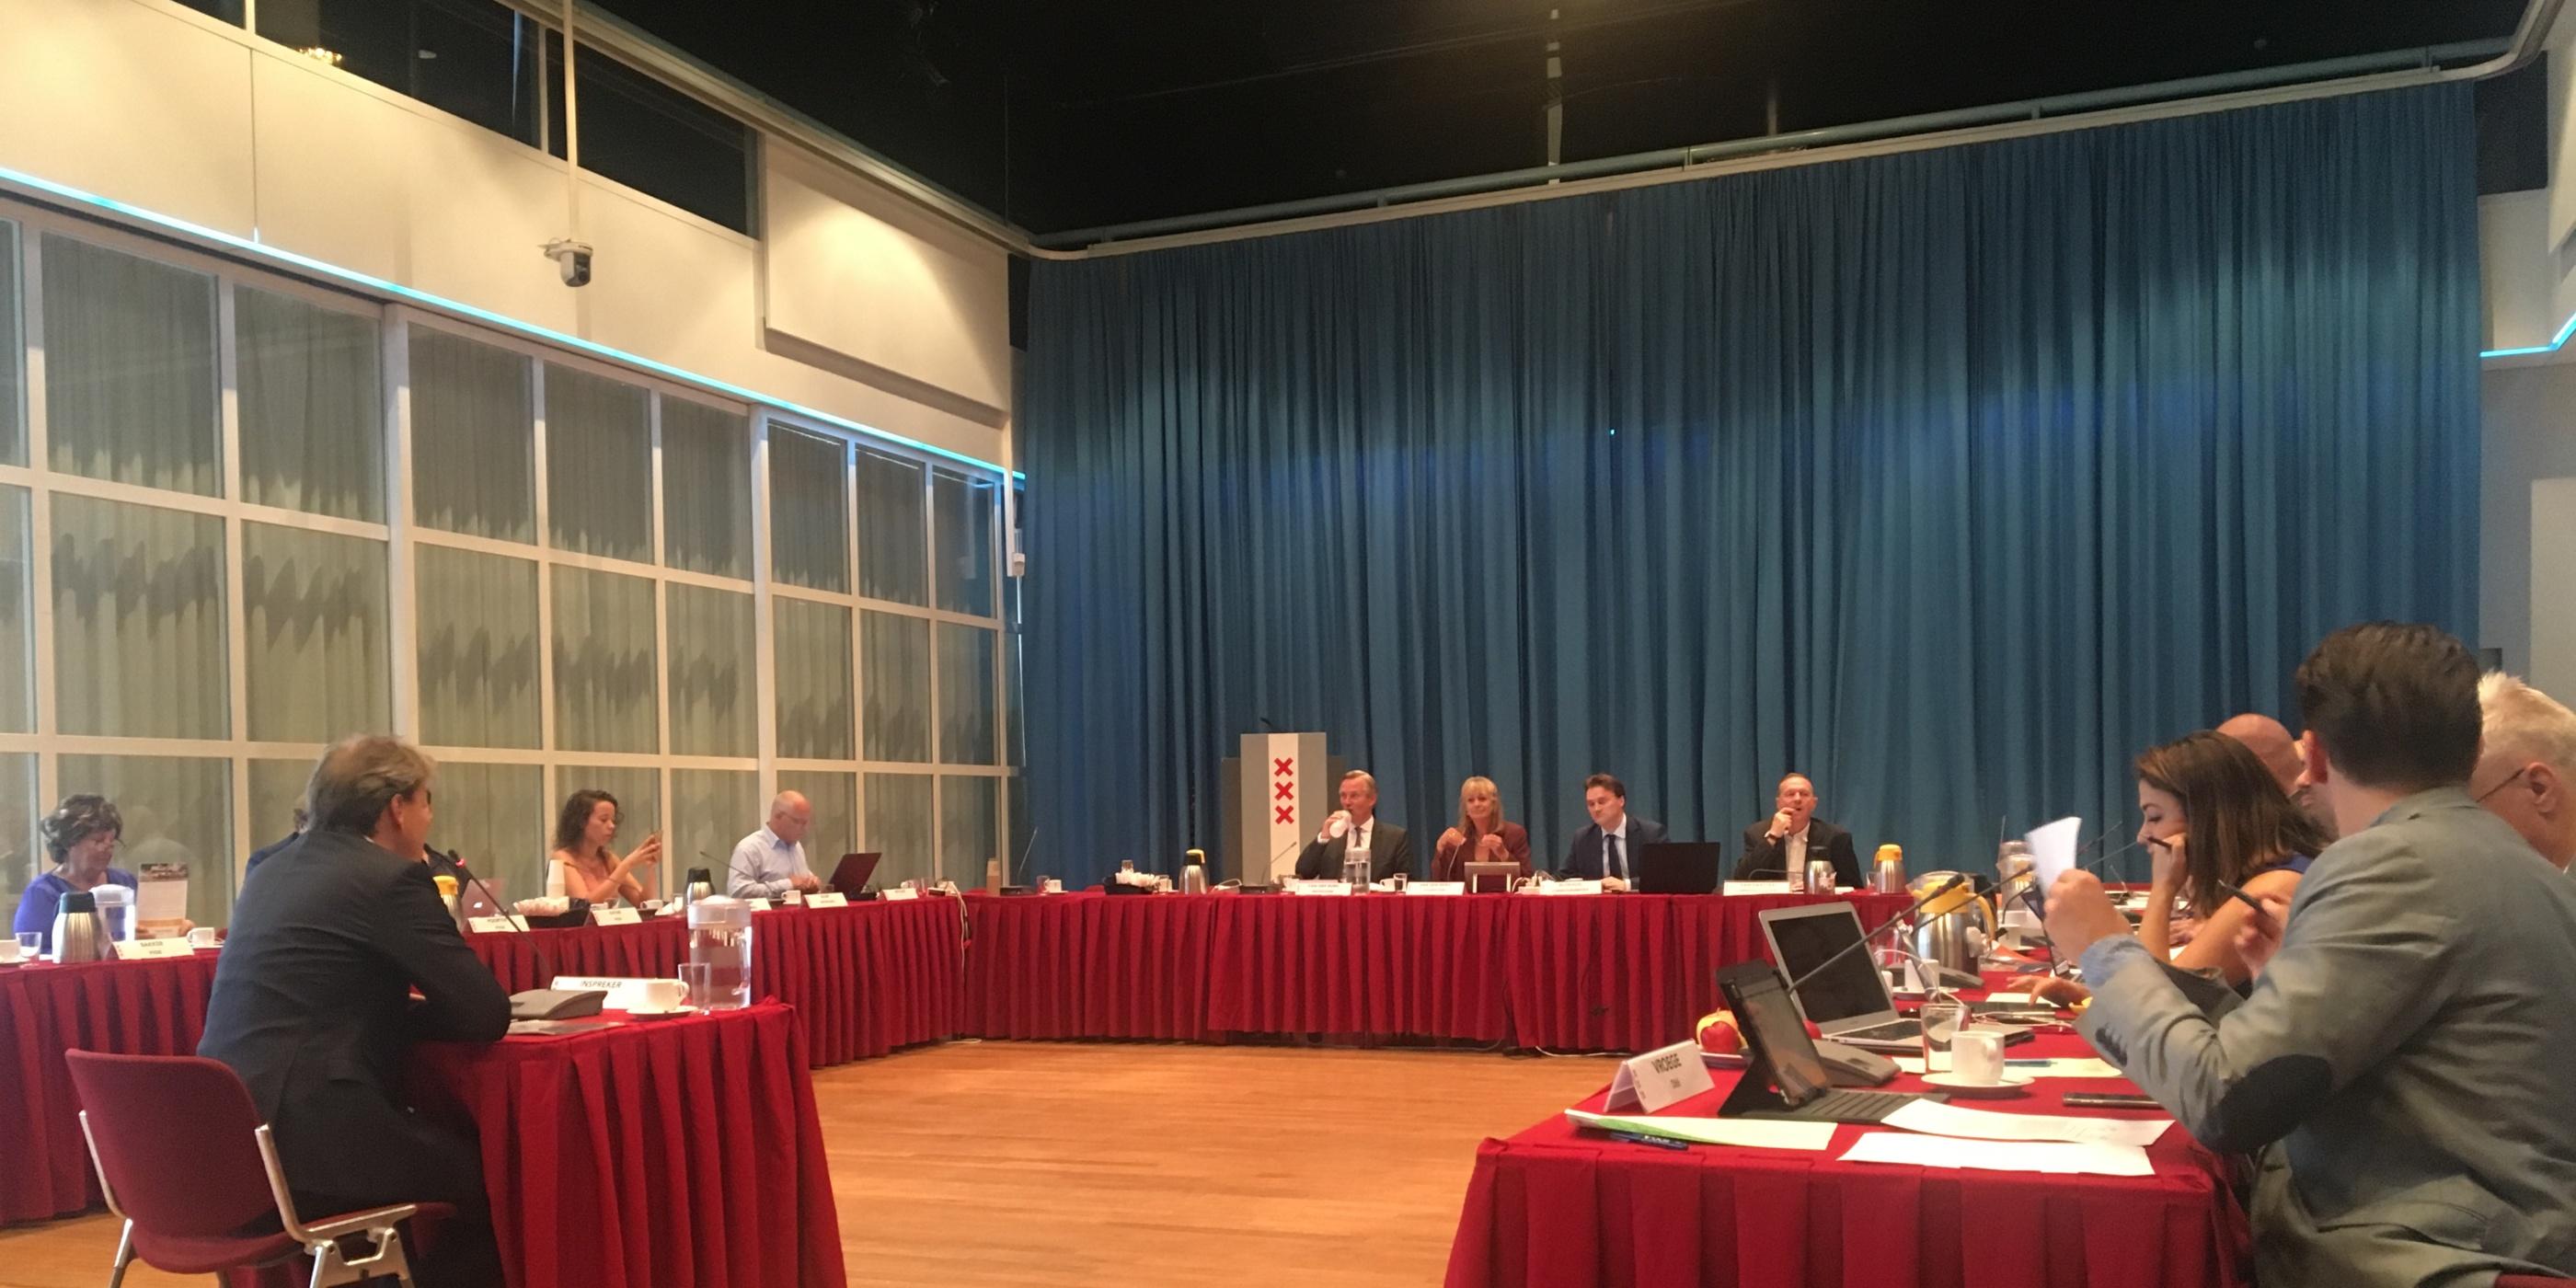 KNHB directeur Erik Gerritsen biedt sport manifest aan in Amsterdam